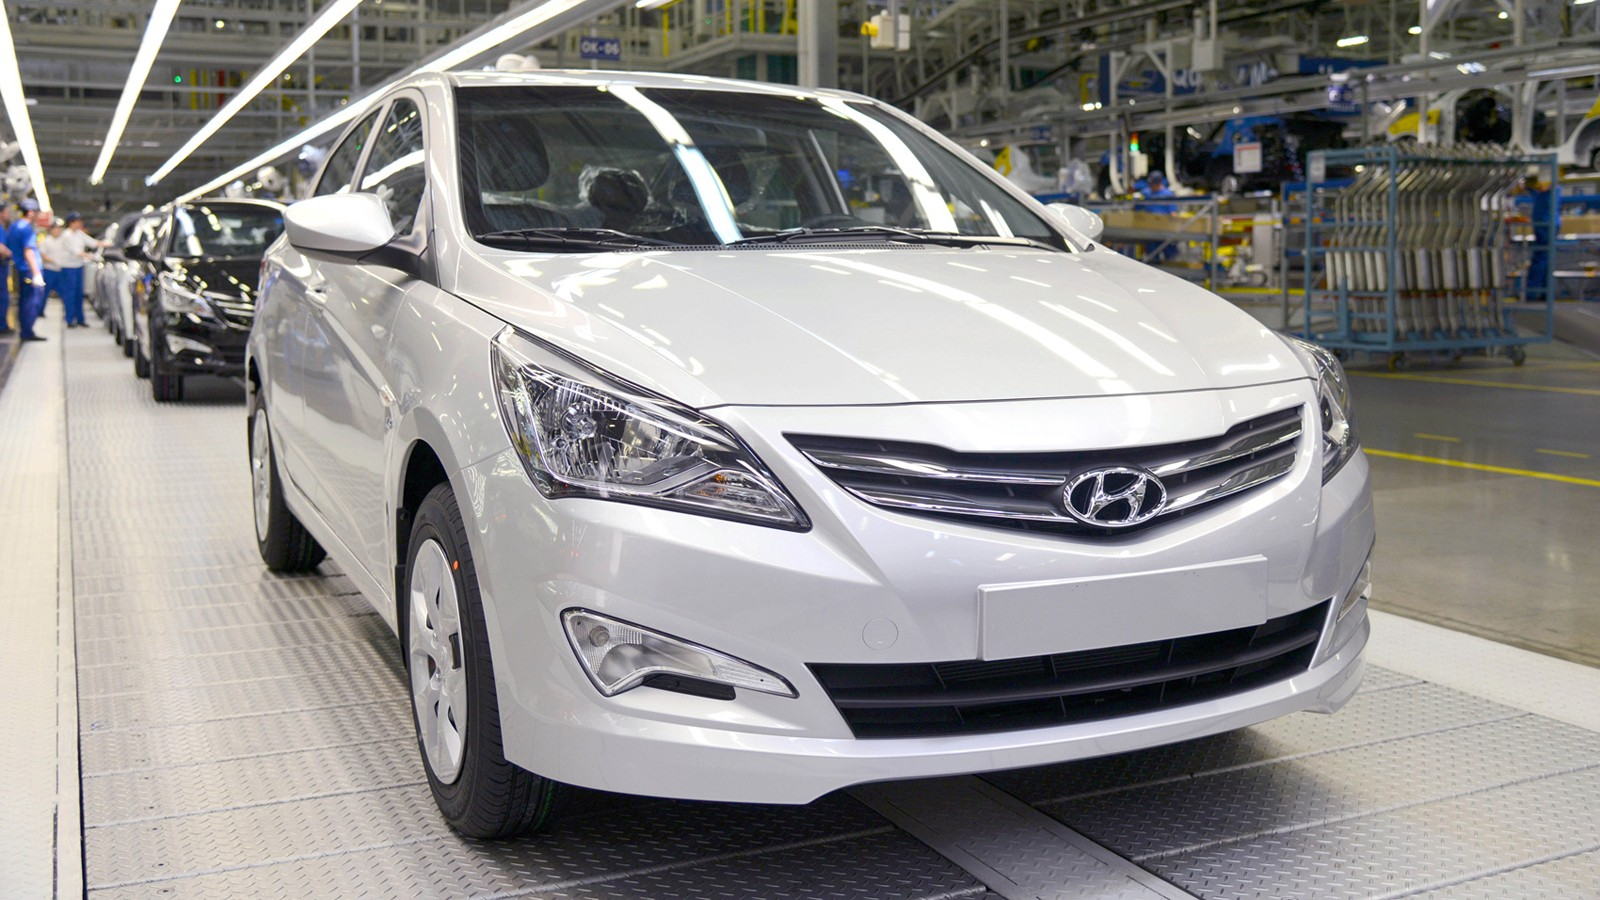 151009_HMMR manufactures 1 millionth vehicle (2)